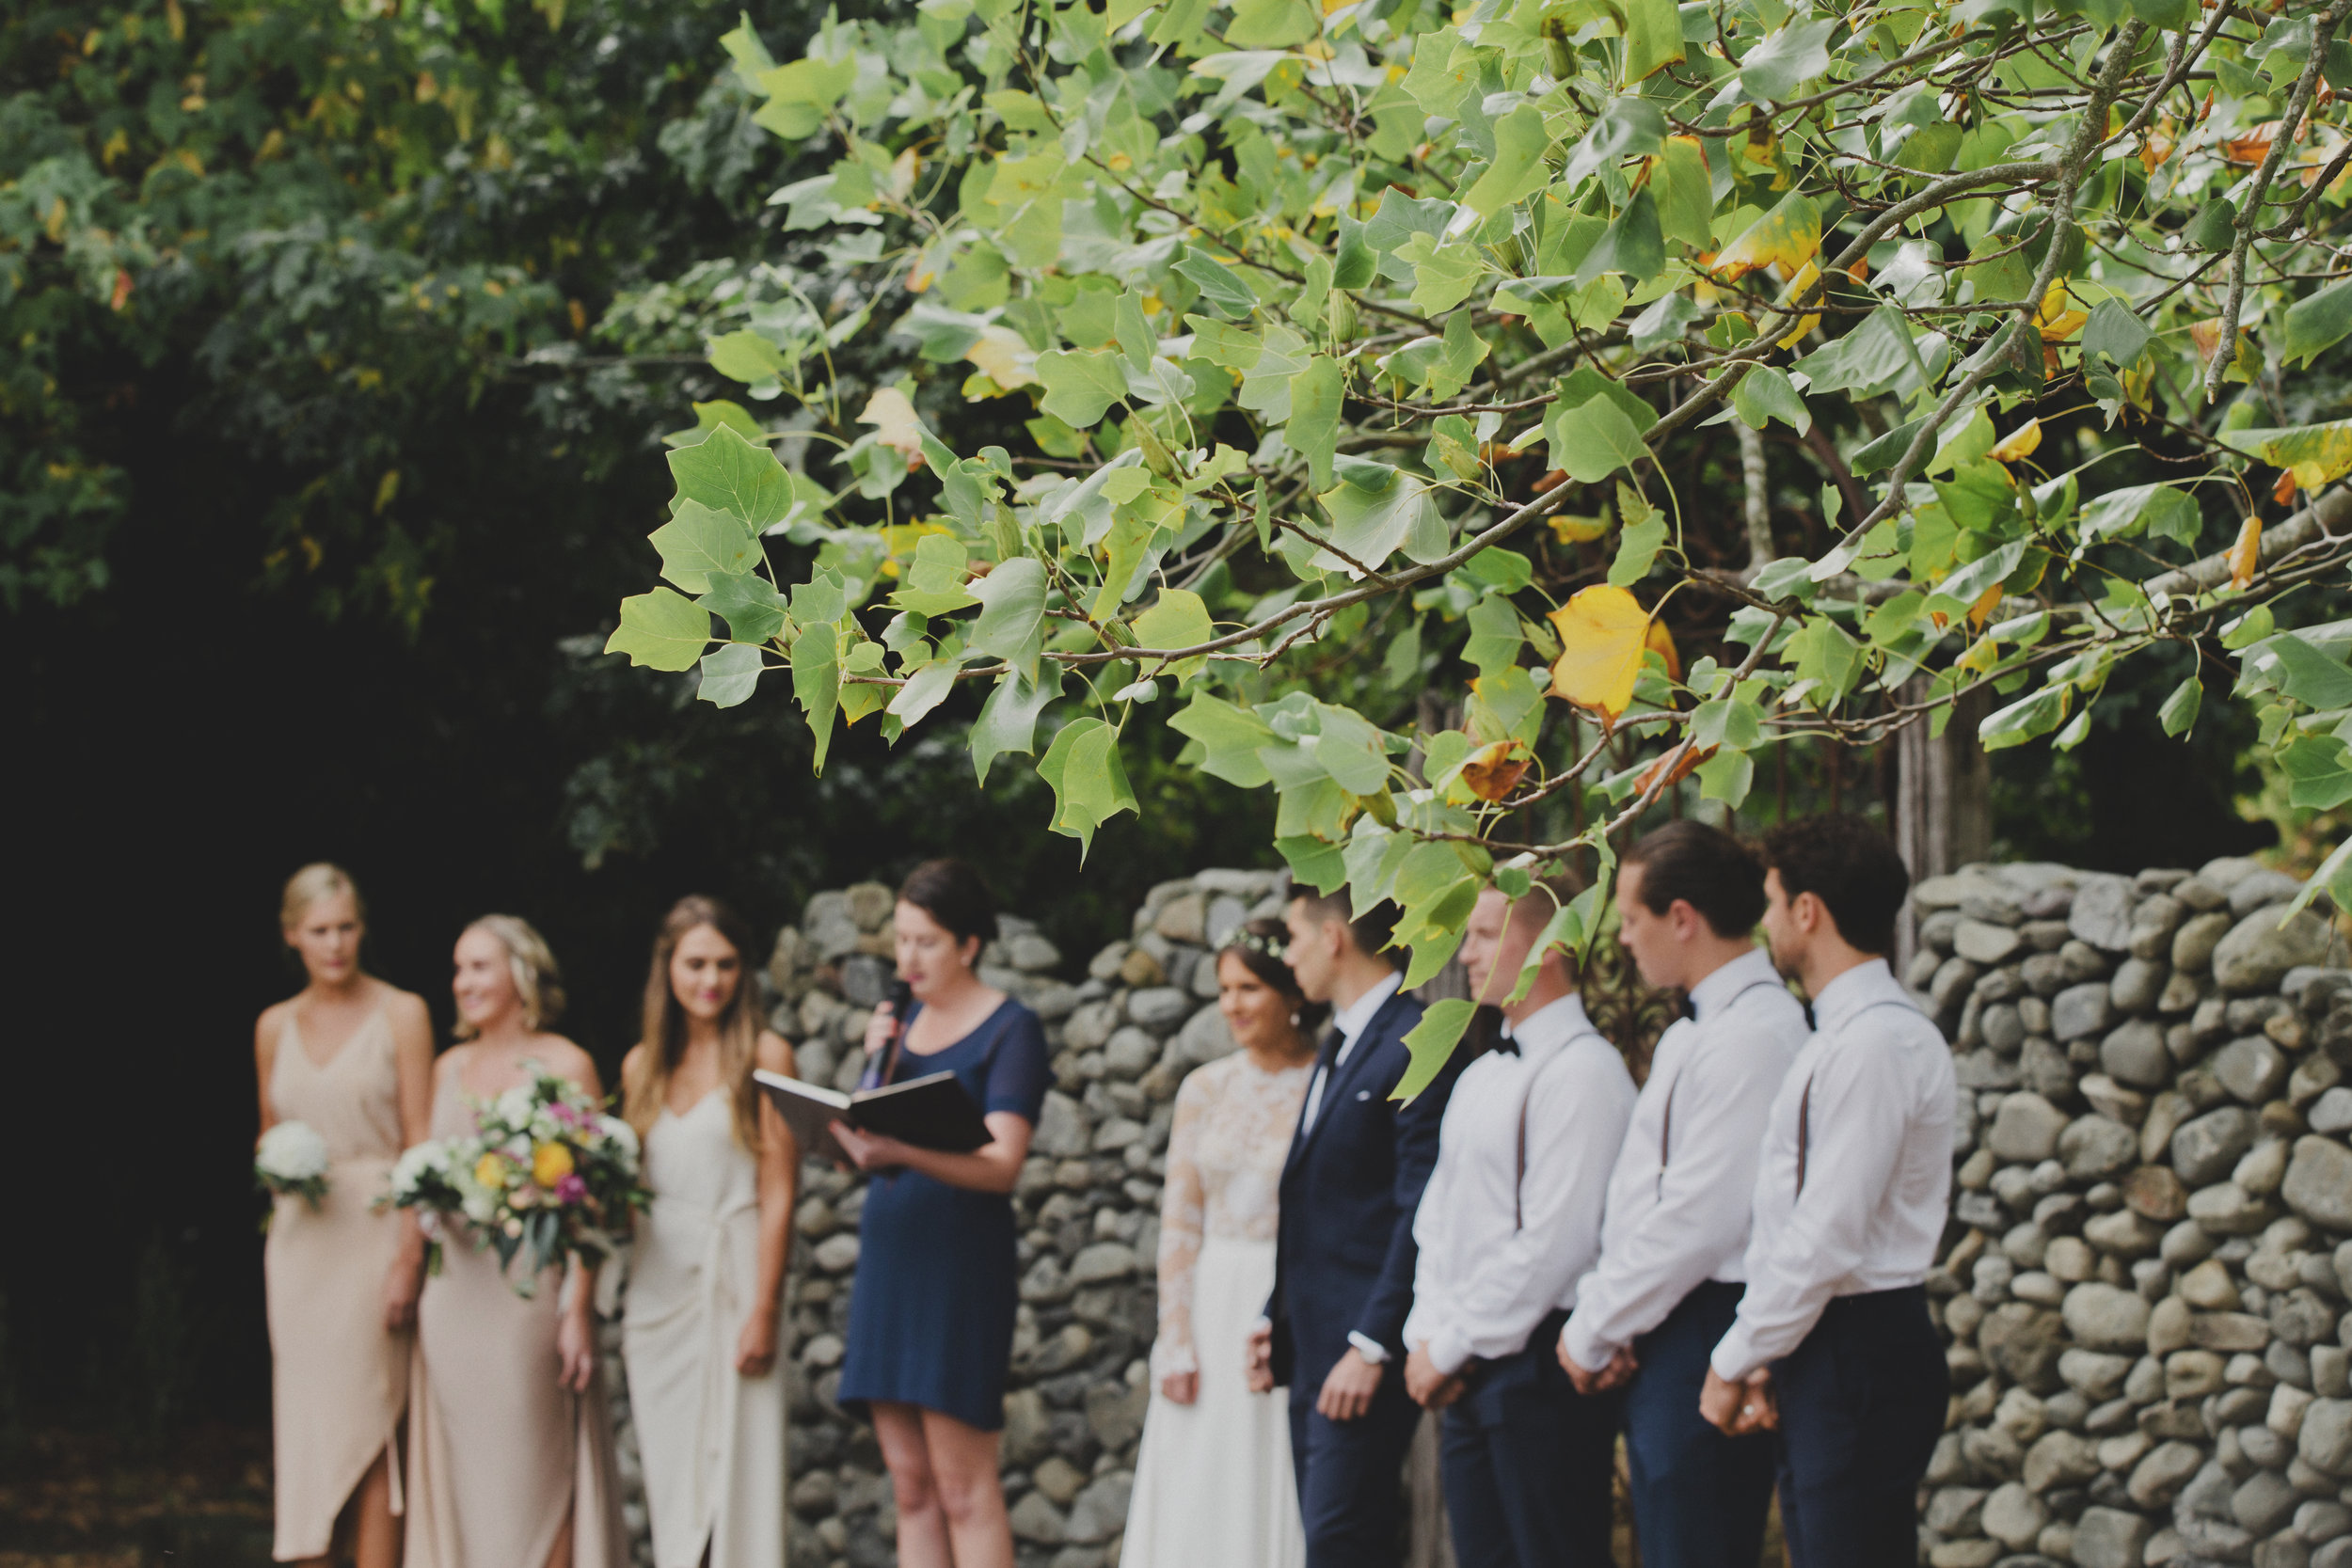 wellington wedding photography NZ - 1036.JPG